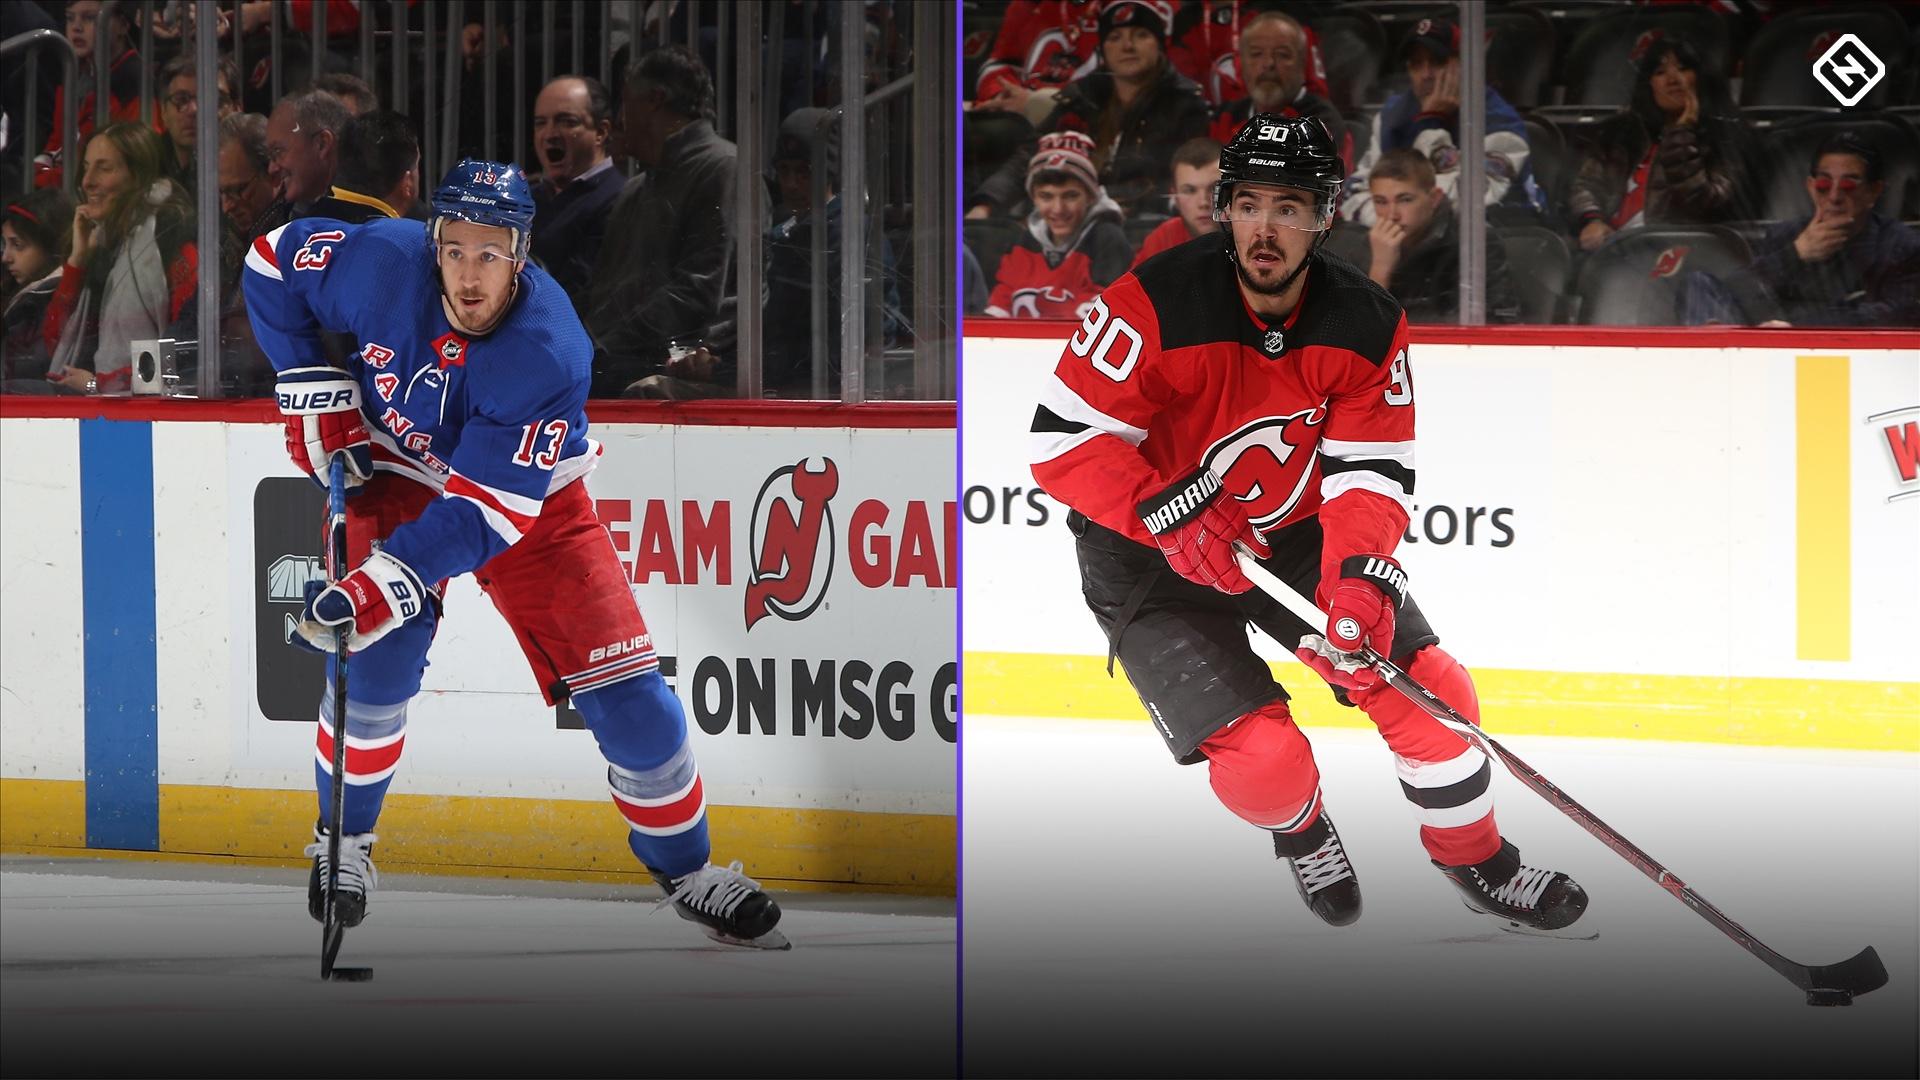 Rangers trade Mats Zuccarello to Dallas for two draft picks